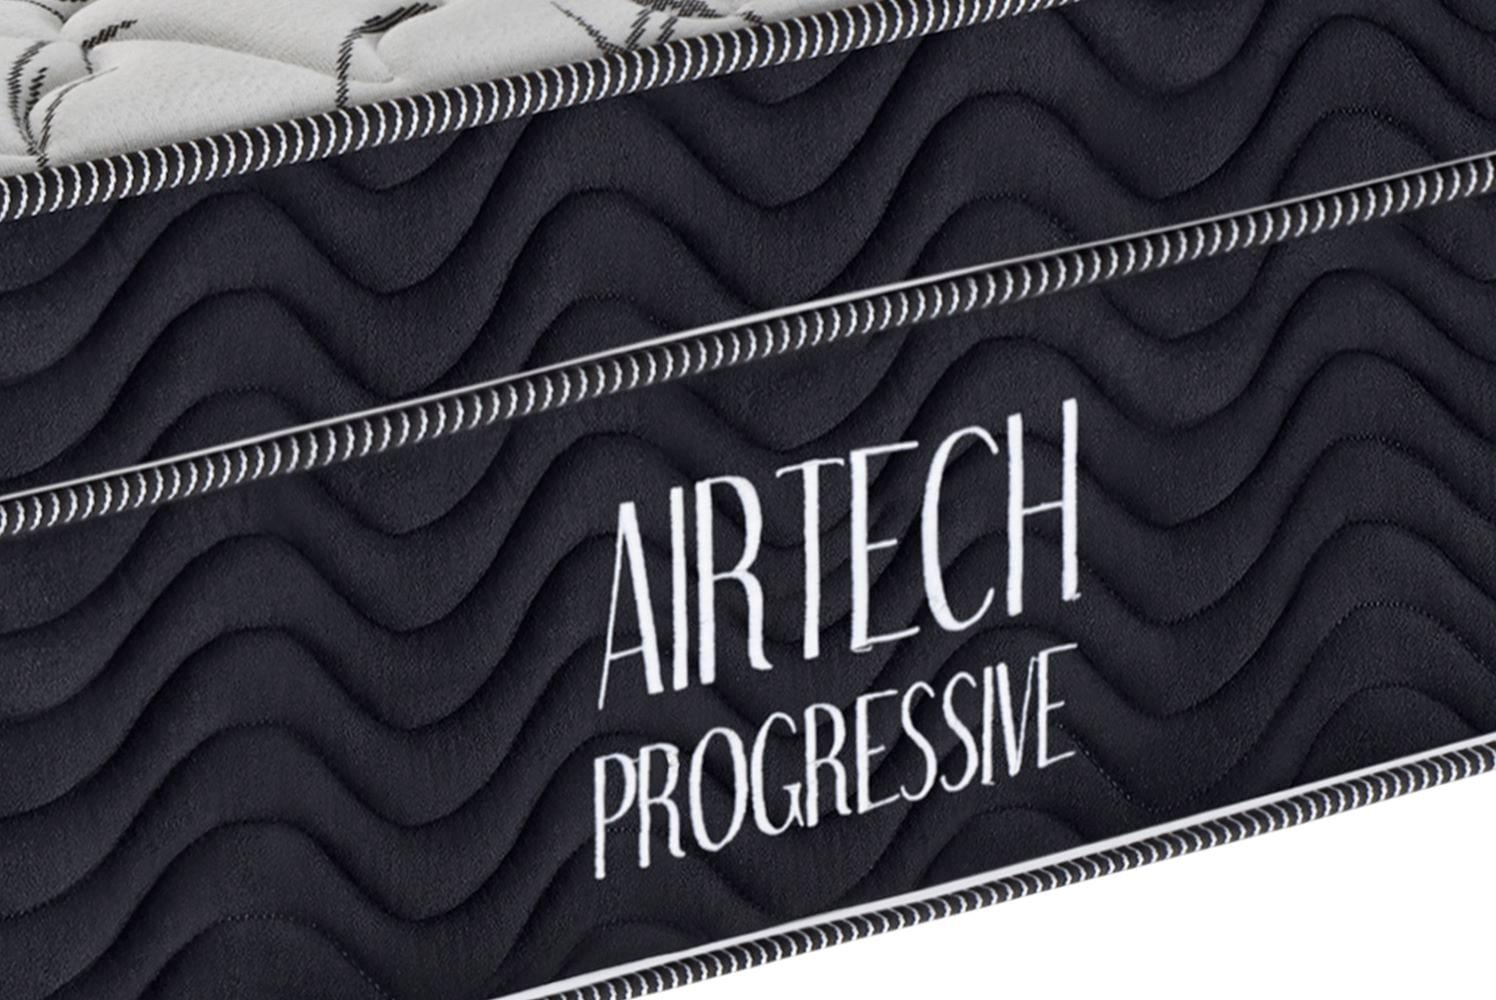 Colchao Airtech Progressive Nanolastic Casal  1,38 cm (LARG) - 49051